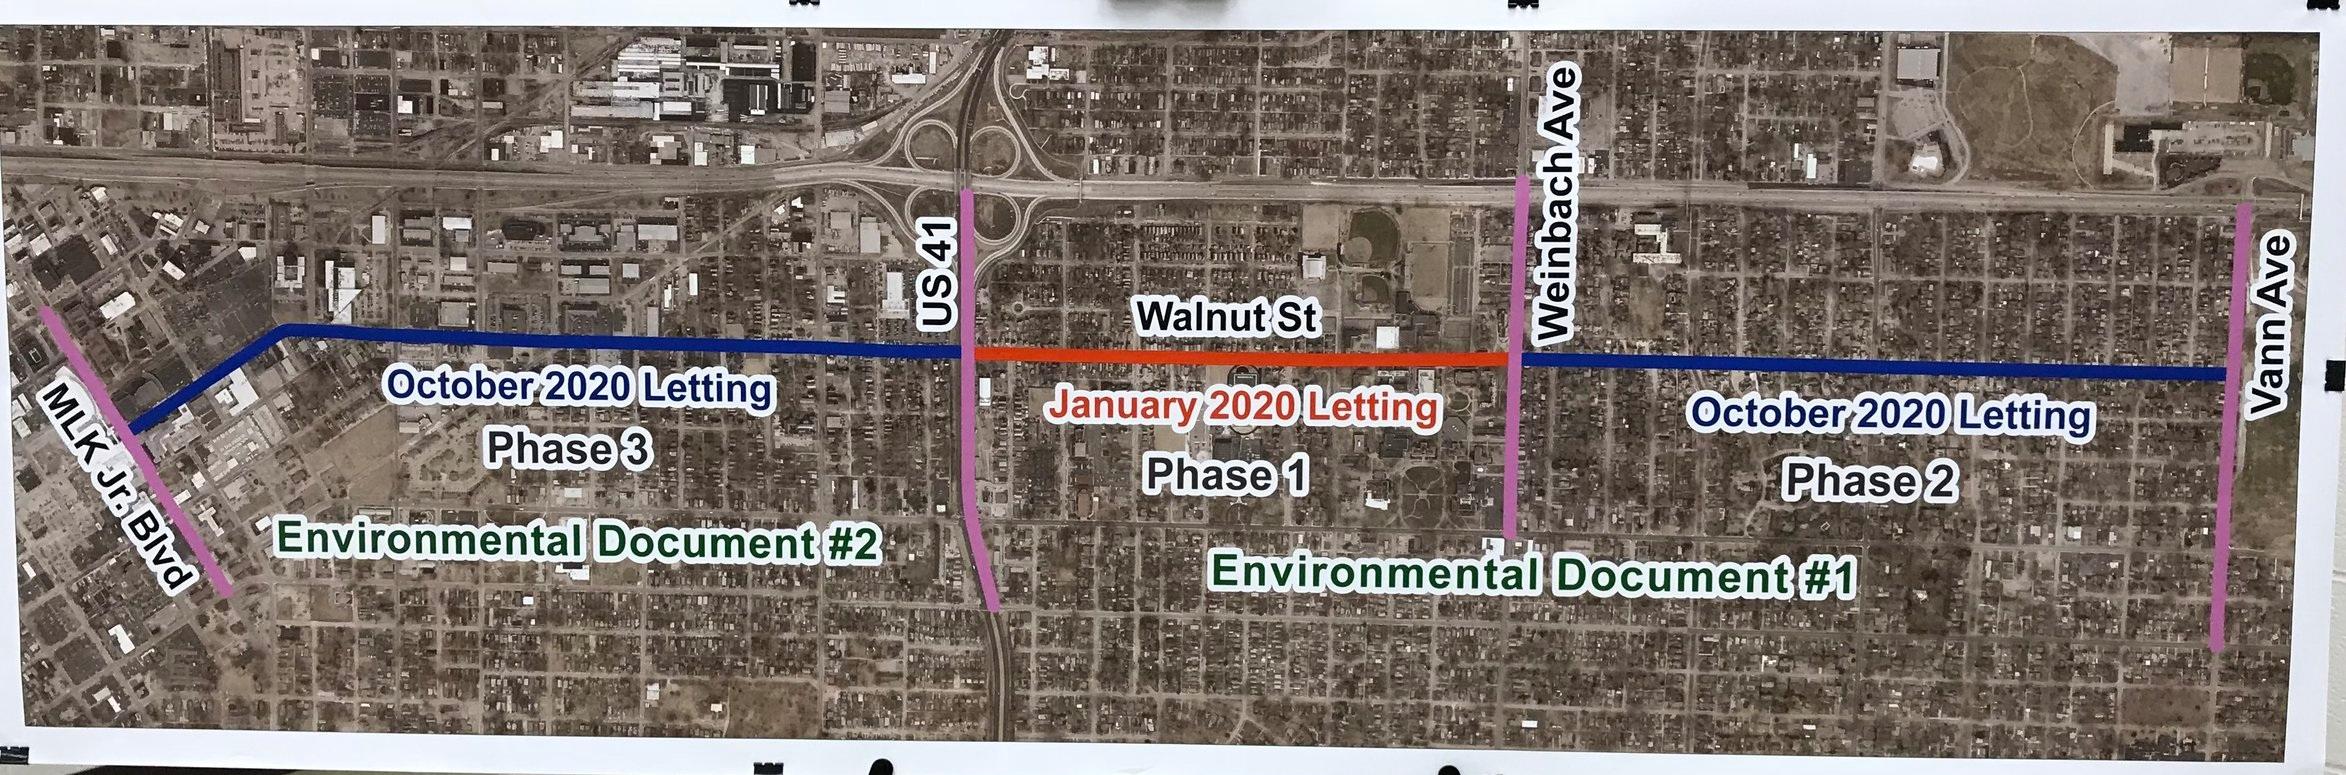 Proposed Walnut Street Project Plan